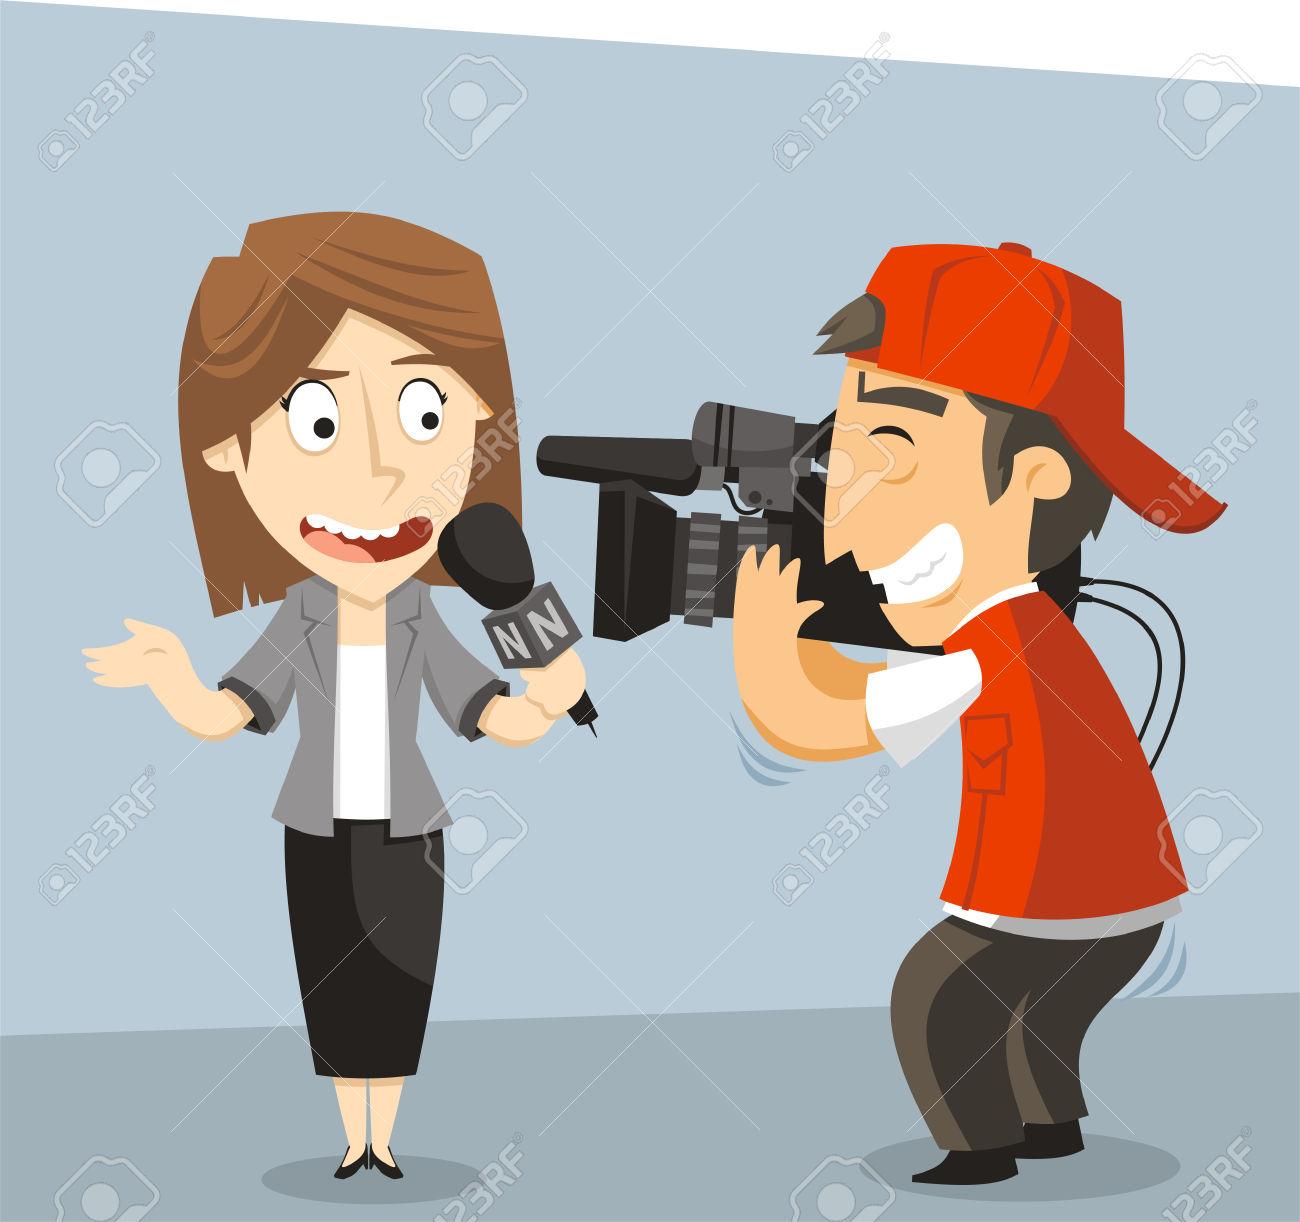 journalist: Journalist News Reporter Interview, with journalist and  interviewee. Vector illustration cartoon.